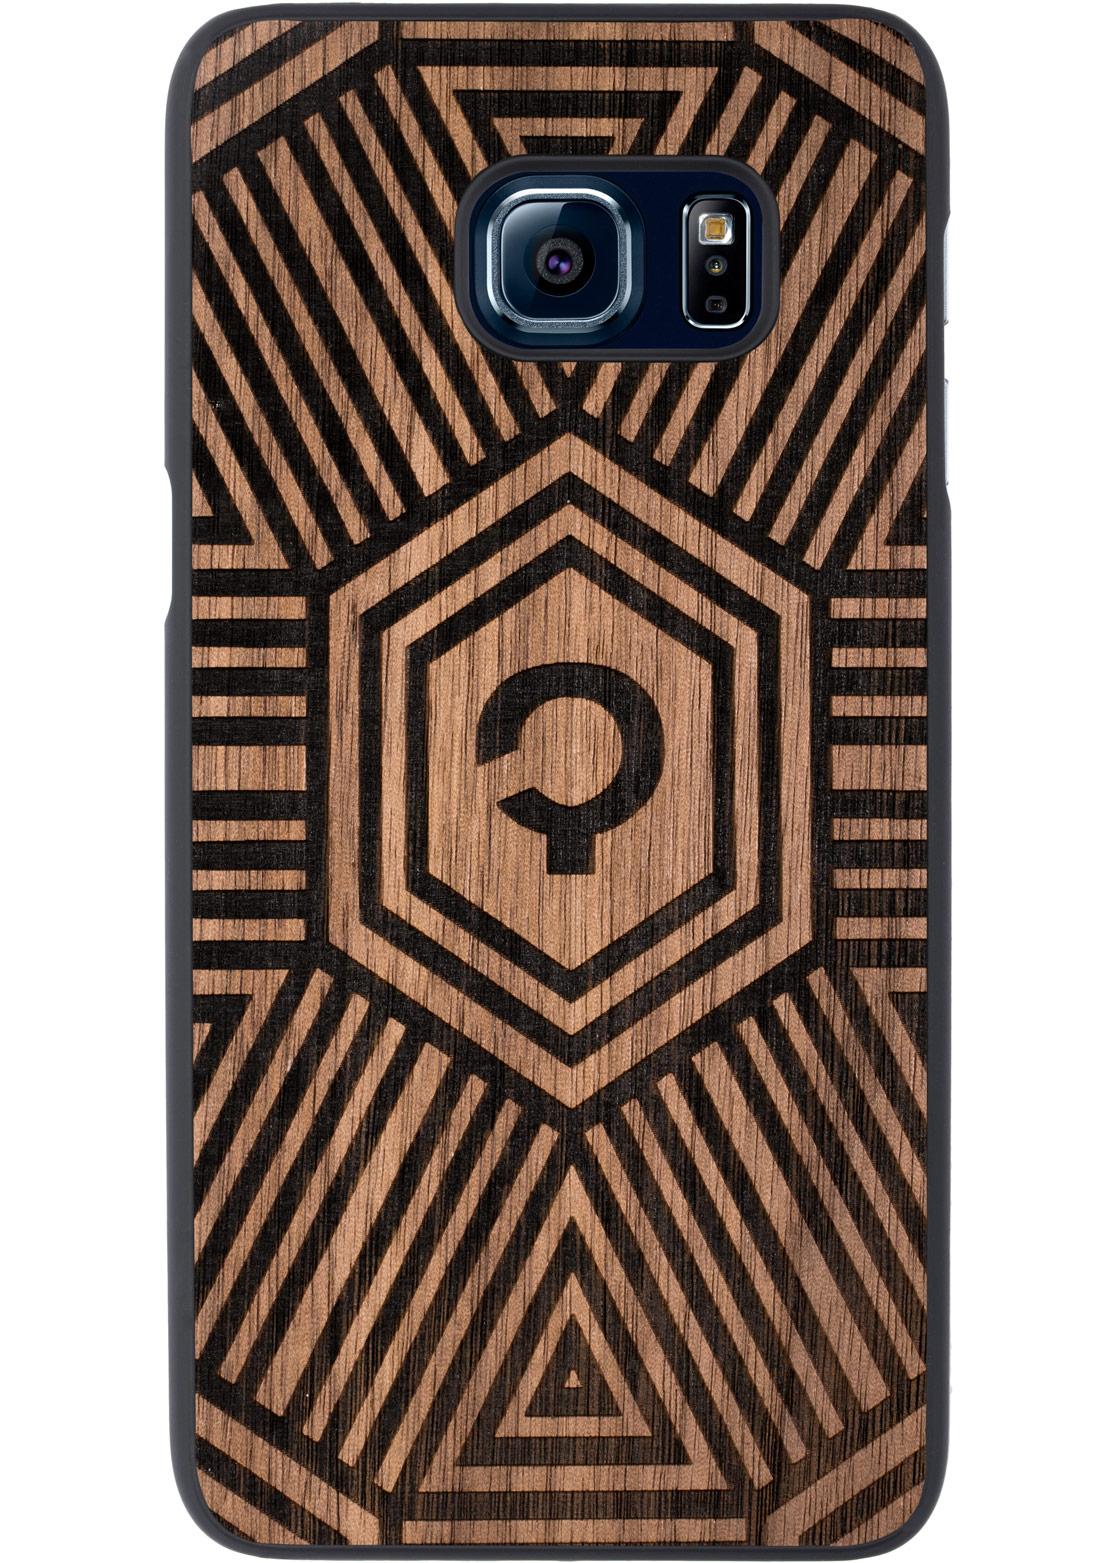 Wooden Case - Samsung Galaxy S6 EDGE Plus - Walnut - Geometrical